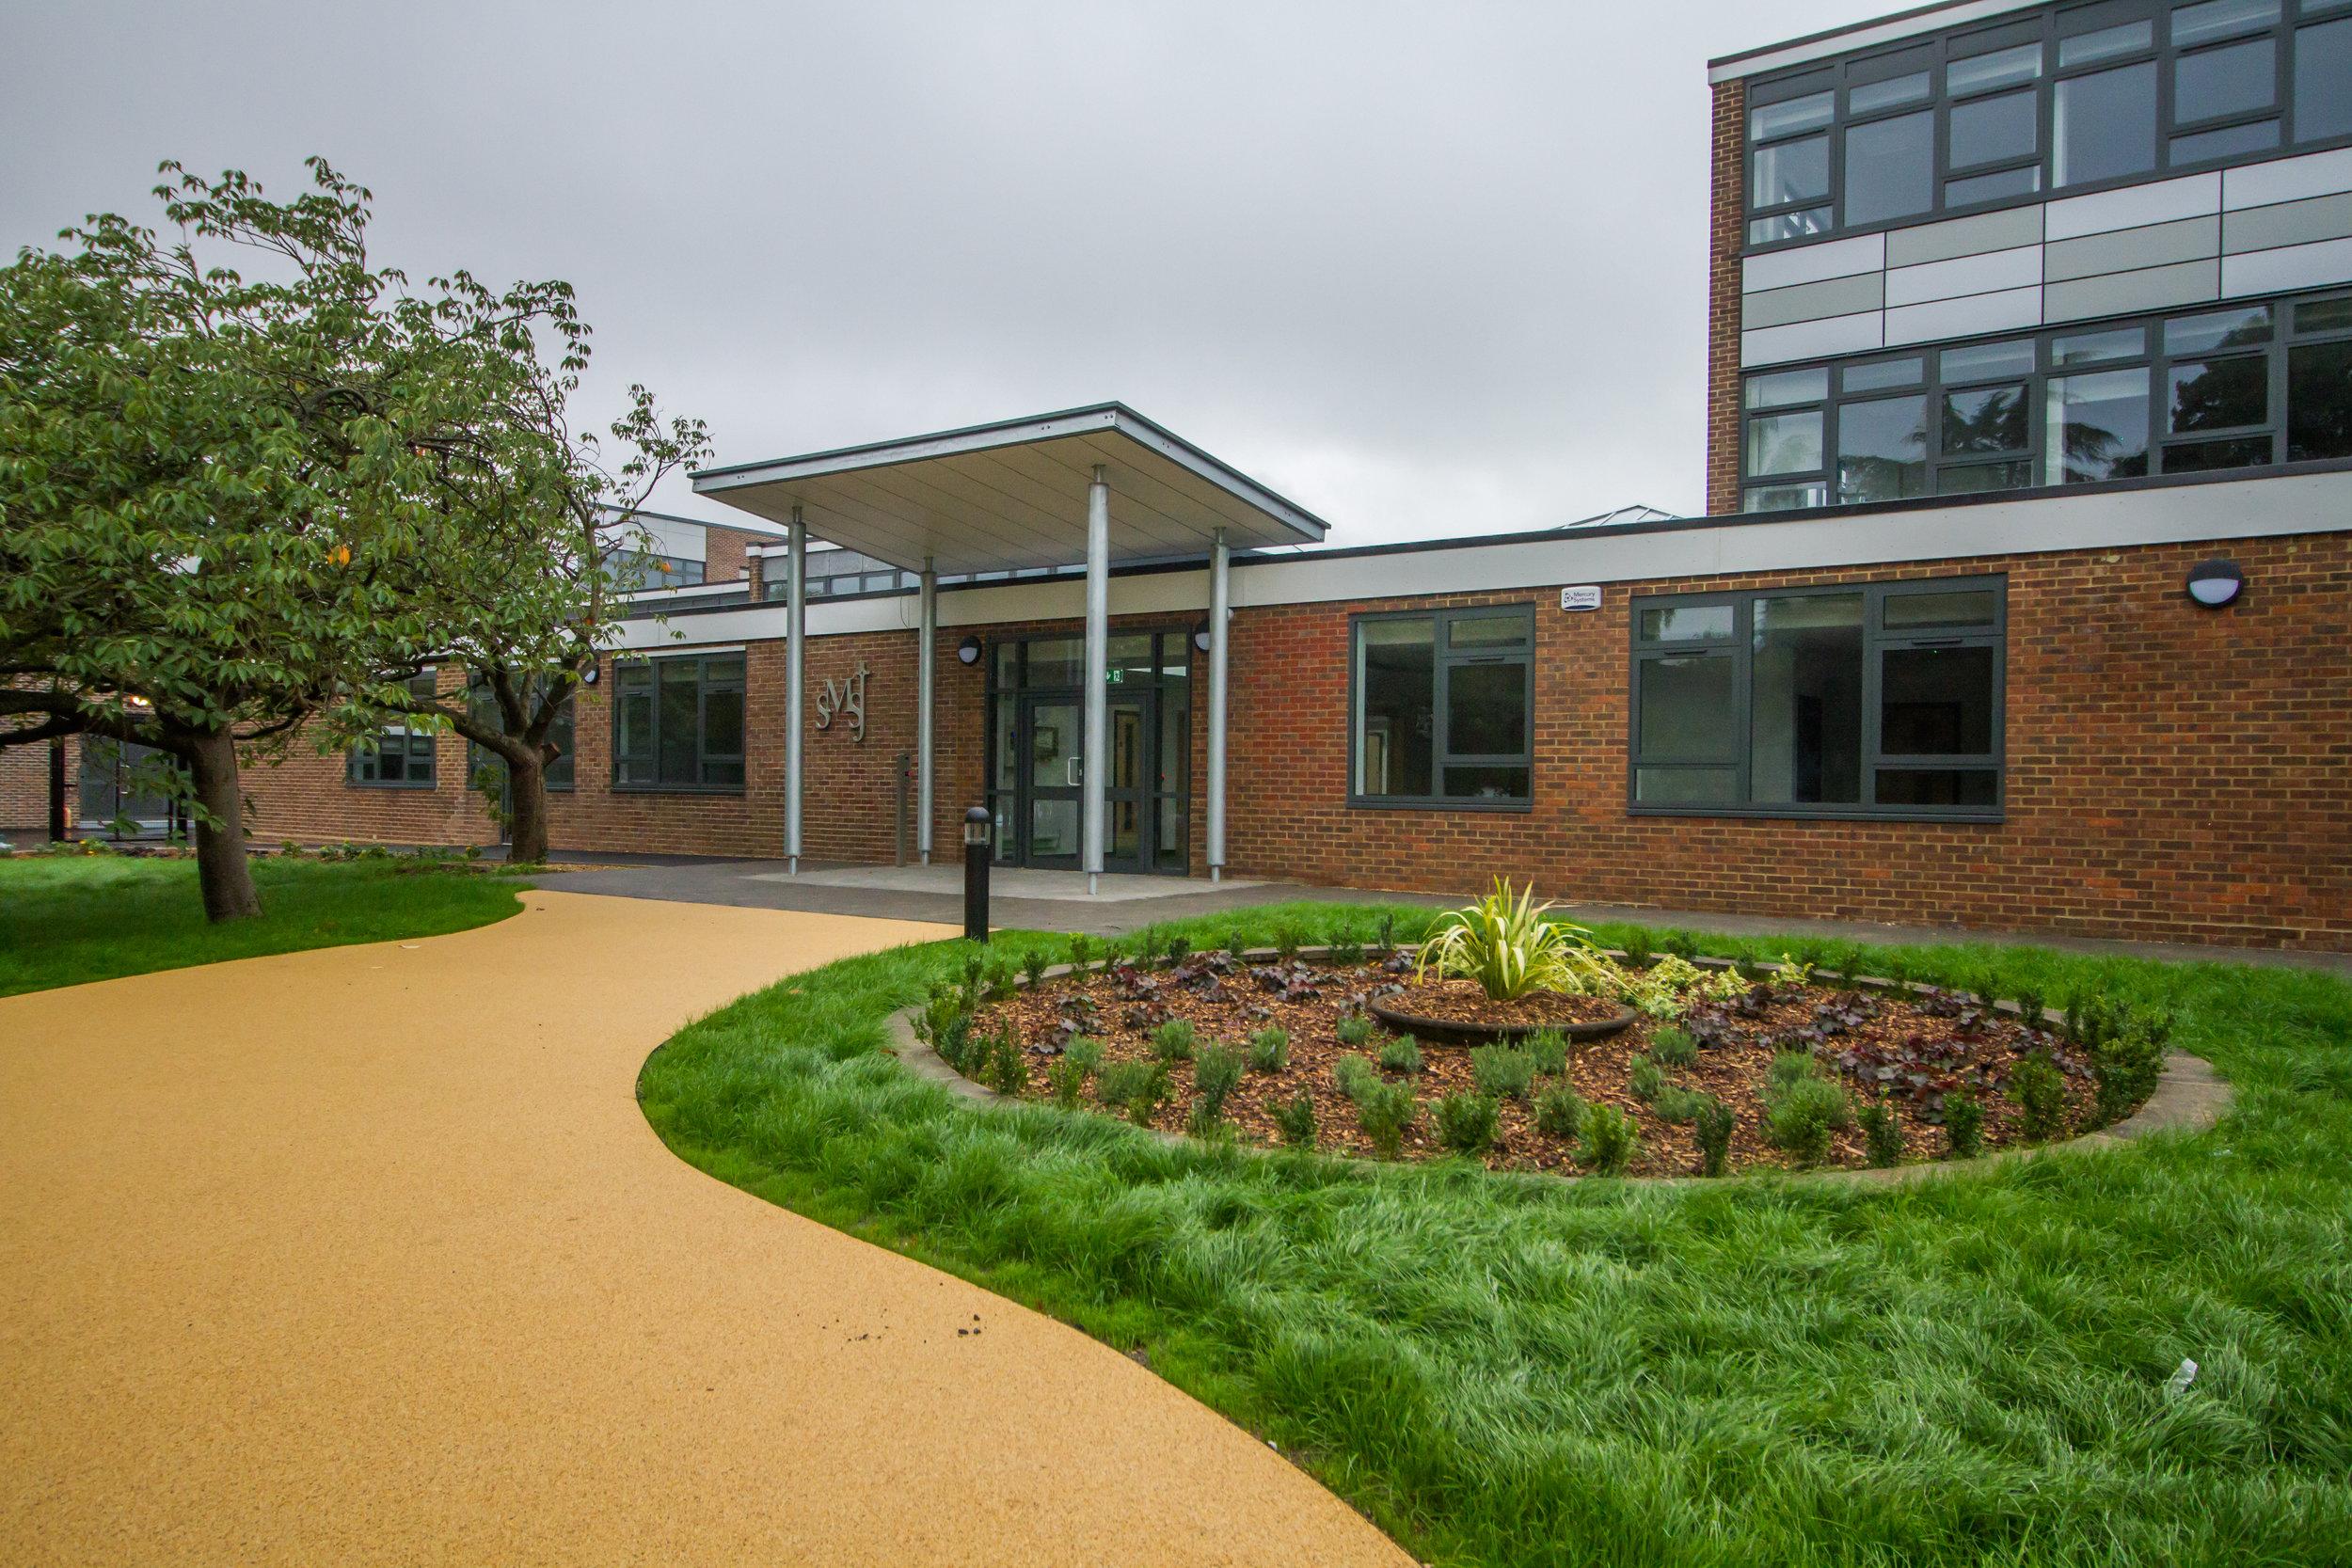 St Mary's and St John's c of e school -